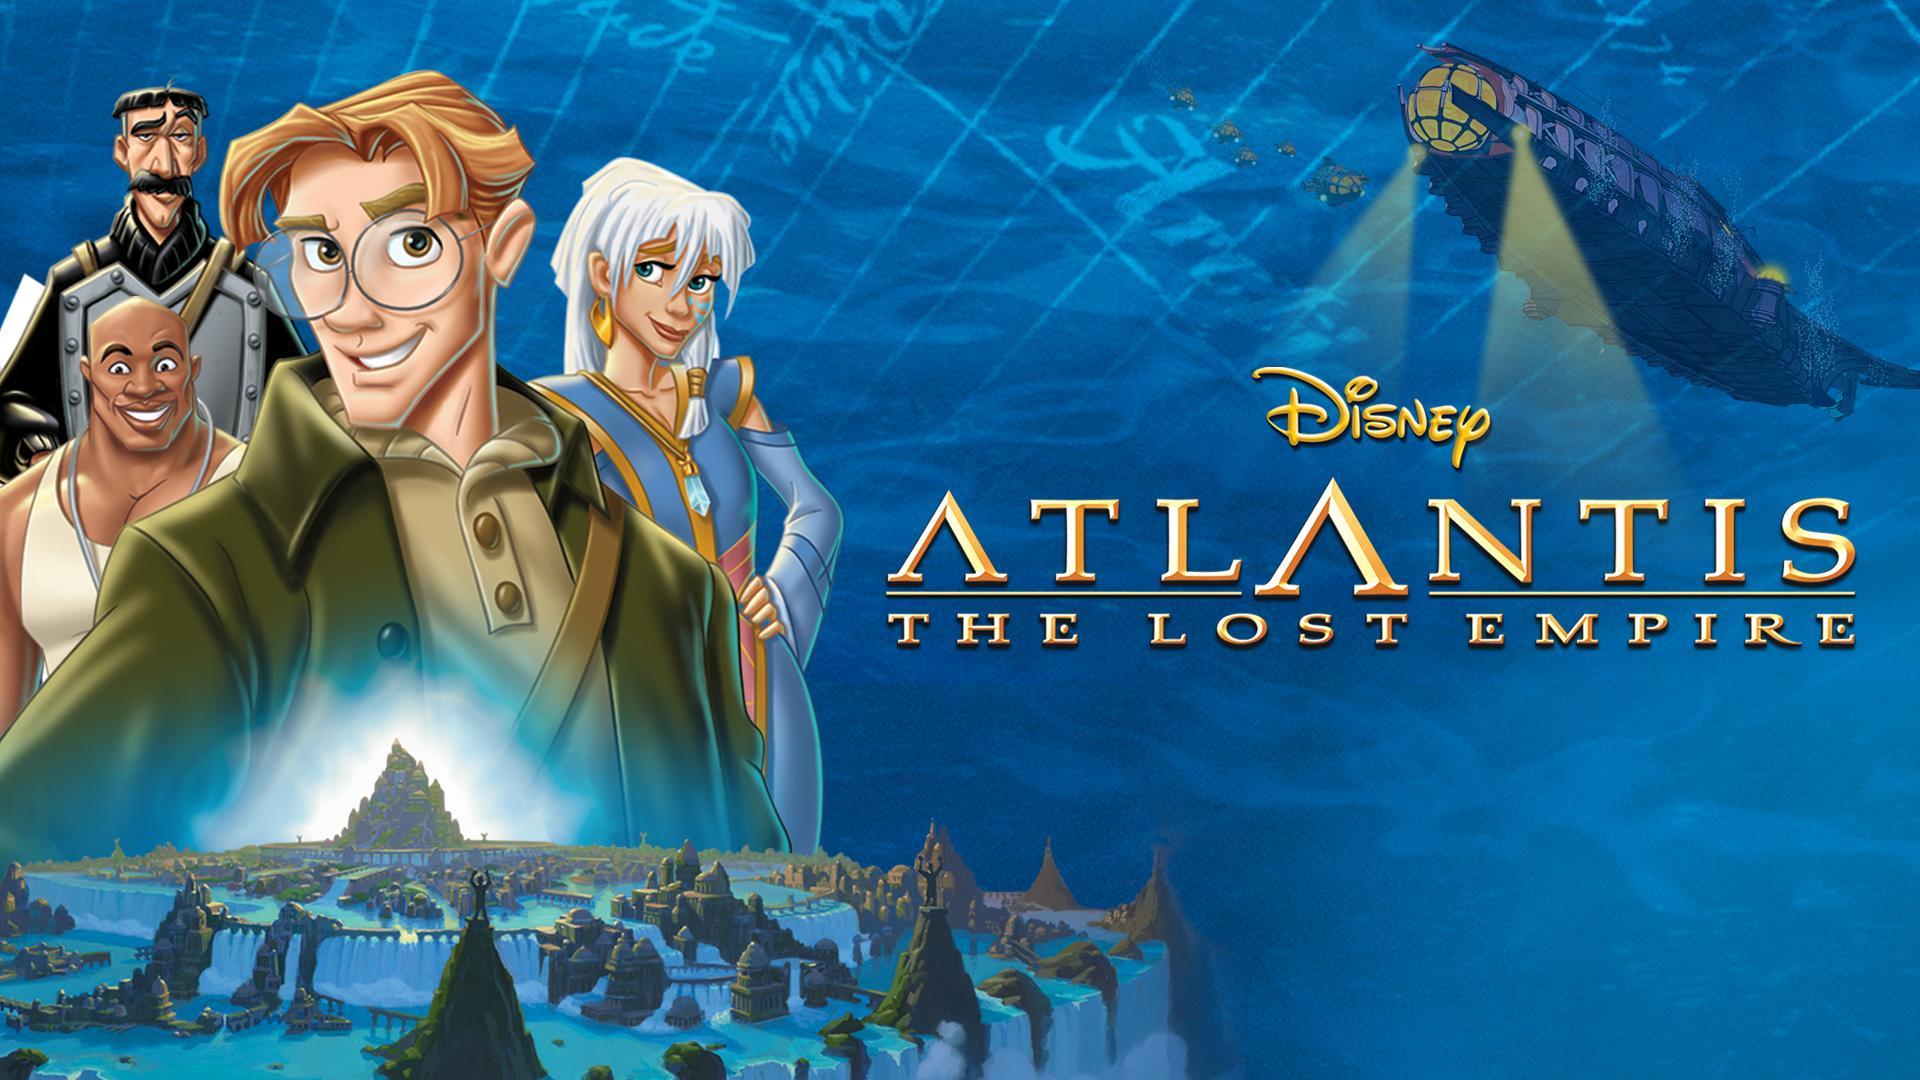 Disney On Twitter Atlantis The Lost Empire 2001